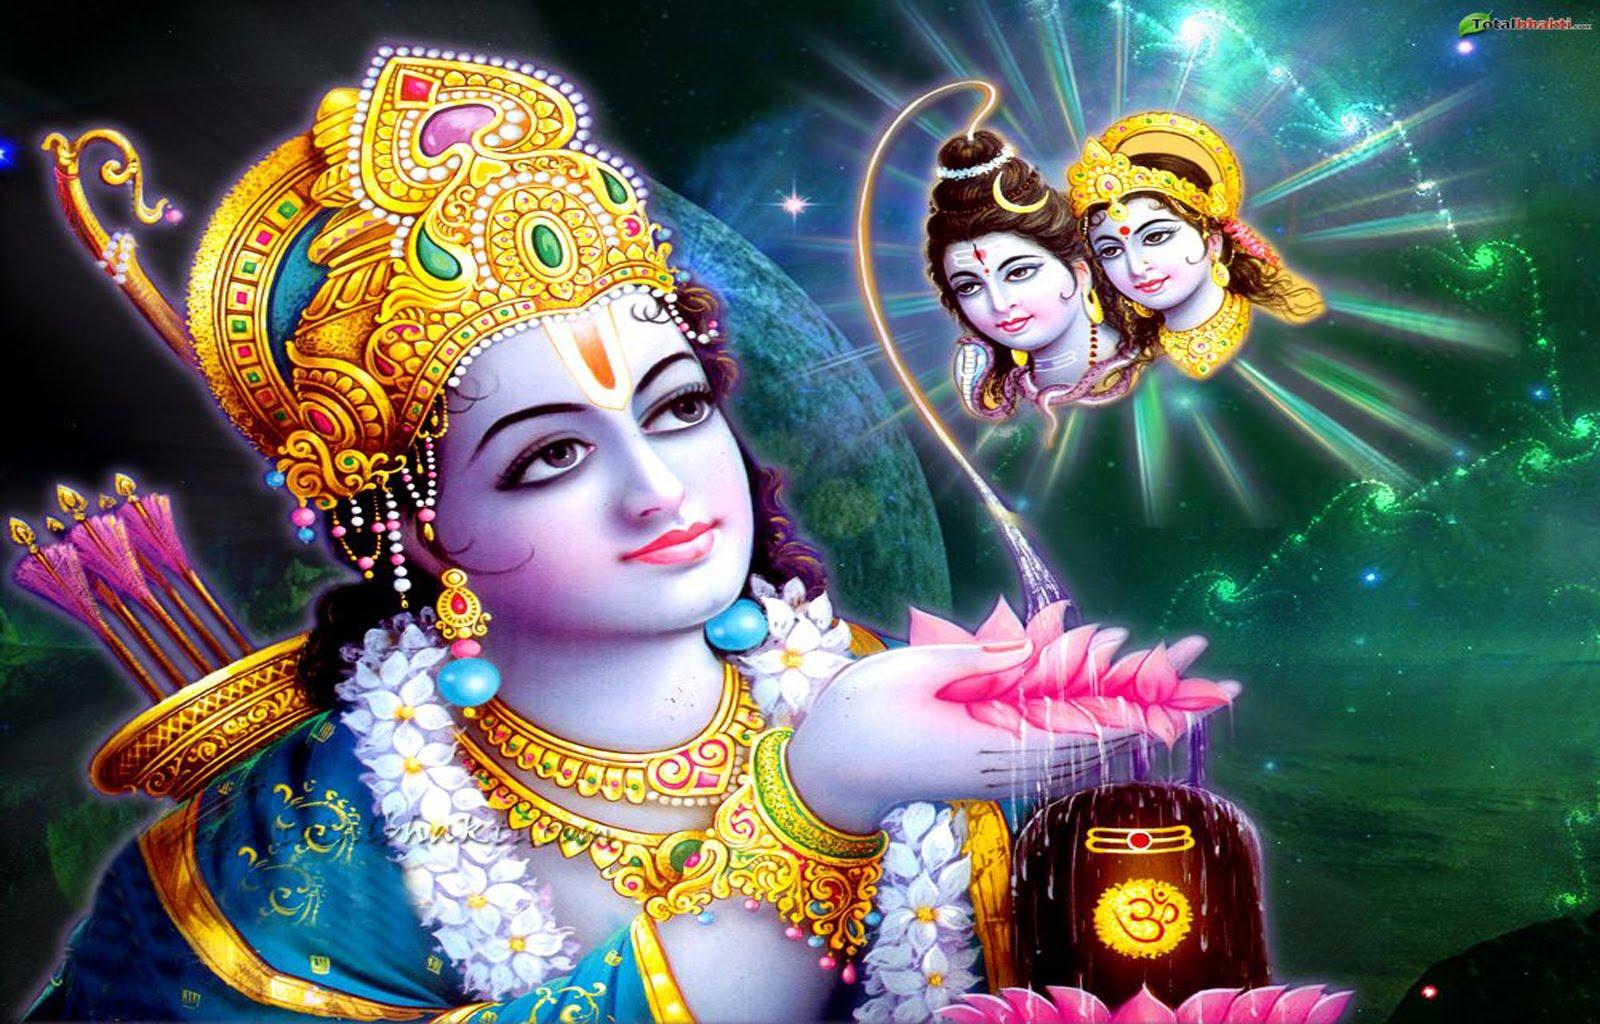 http://3.bp.blogspot.com/-vX9WC0HSPow/T946BNPjjcI/AAAAAAAADDE/Rzbw_4uoyLo/s1600/rama-praying-shiva-479.jpg